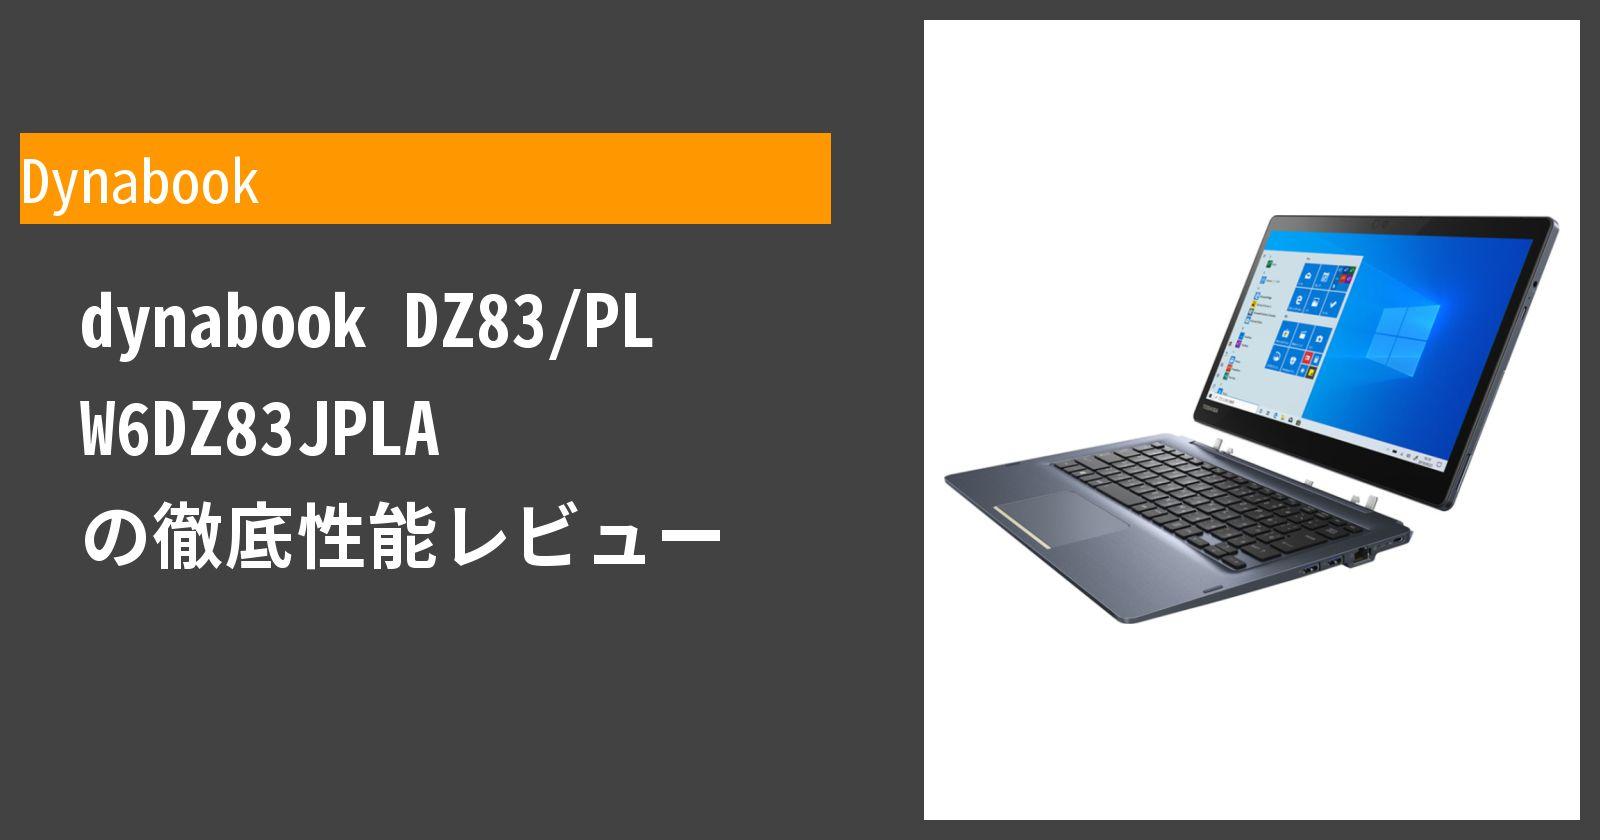 dynabook DZ83/PL W6DZ83JPLA の徹底性能レビュー